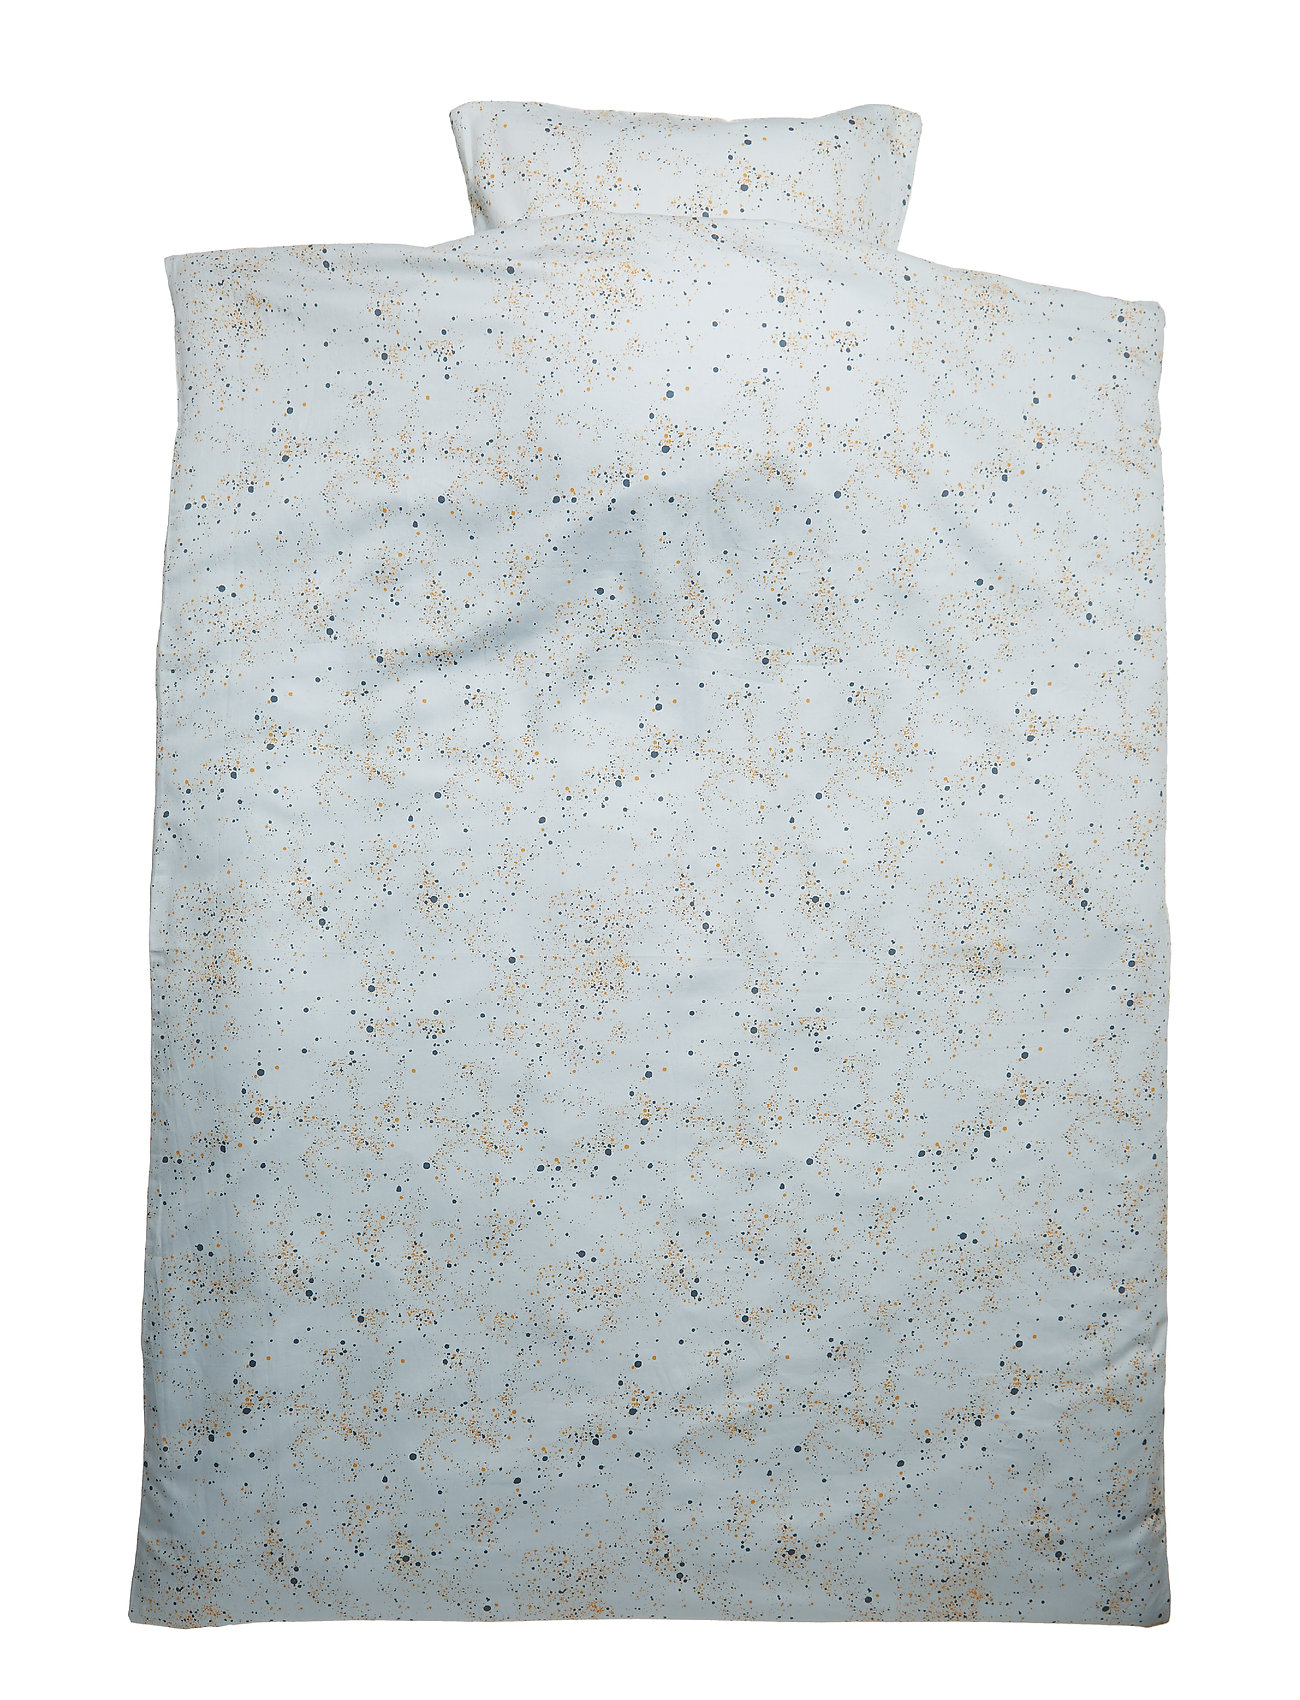 Soft Gallery Bed Linen Junior - OCEAN GREY, AOP MINI SPLASH BLUE